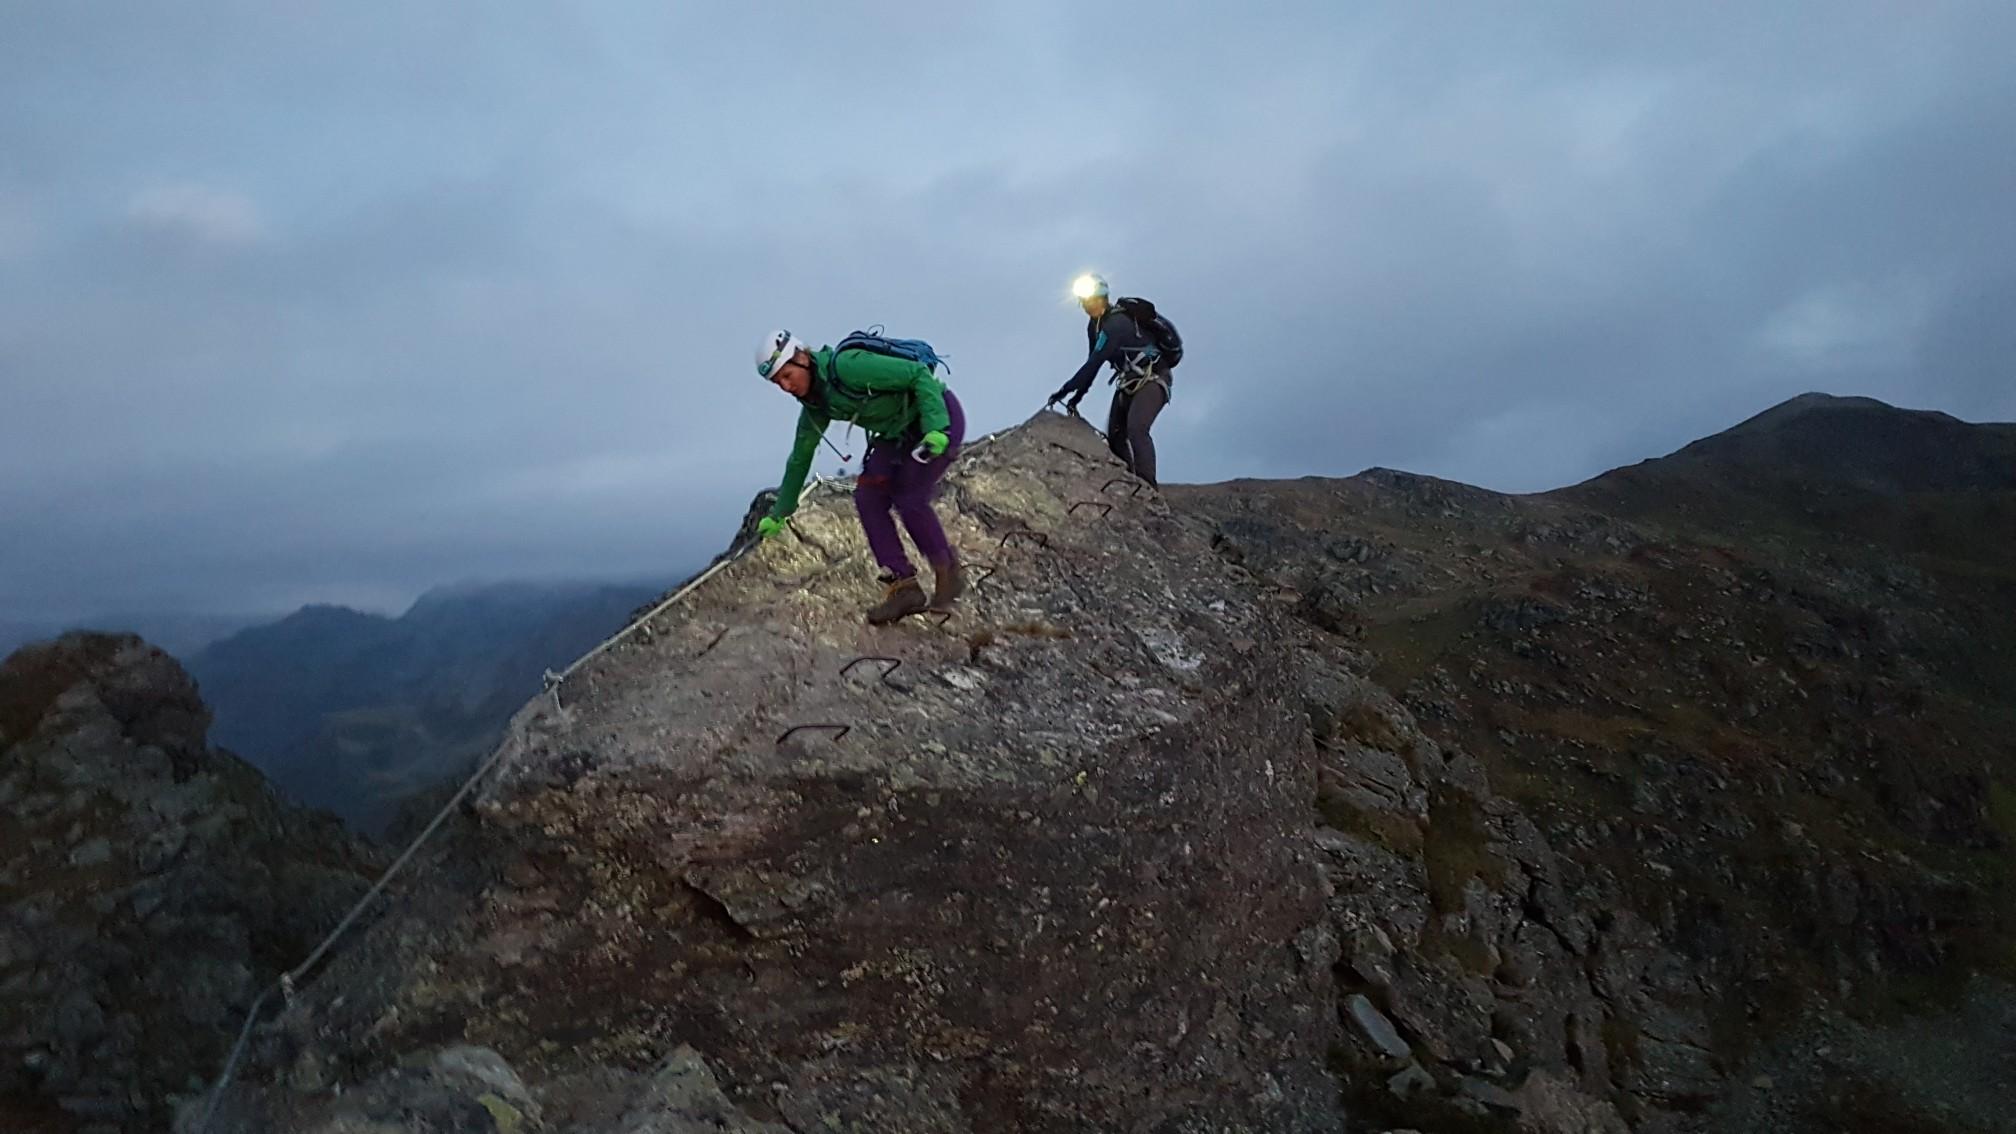 Klettersteig Madrisella : Madrisella burg klettersteig klettertour komoot